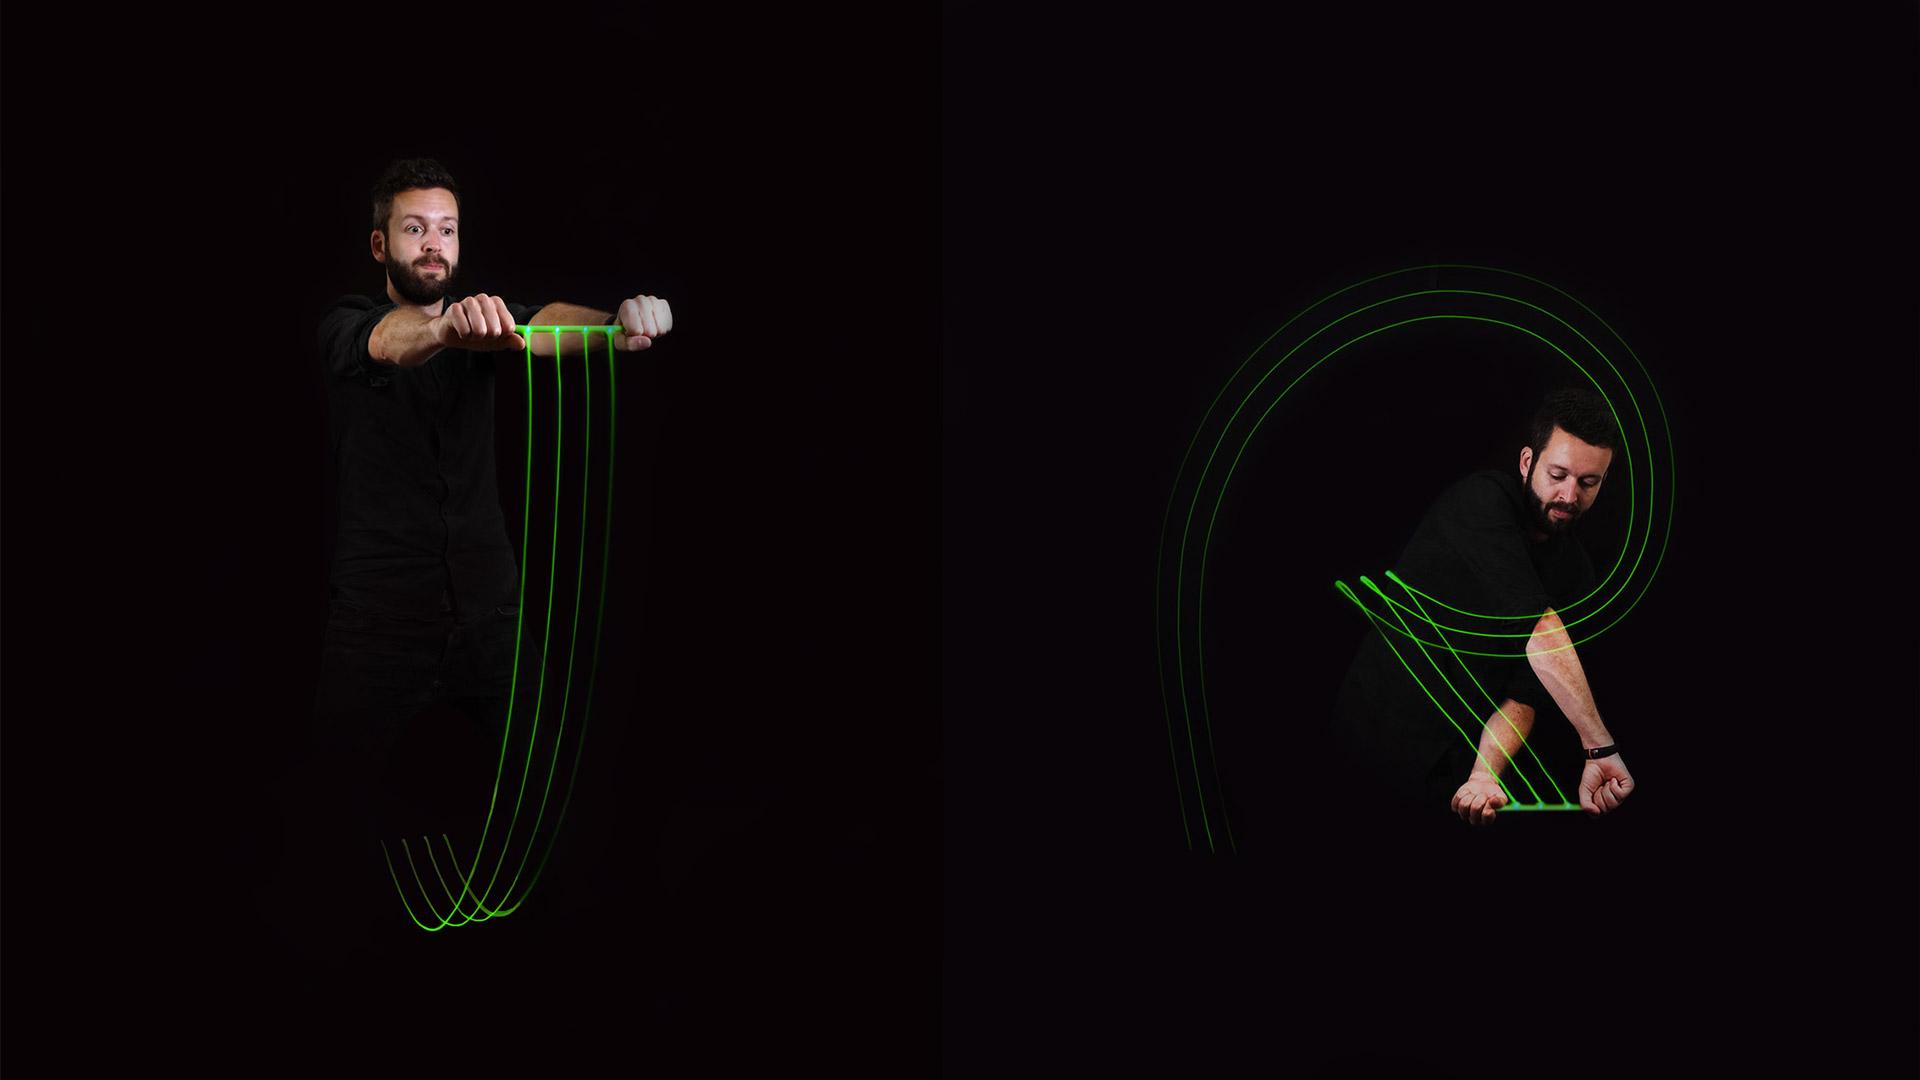 Green Athletics – Fotografisches Experiment